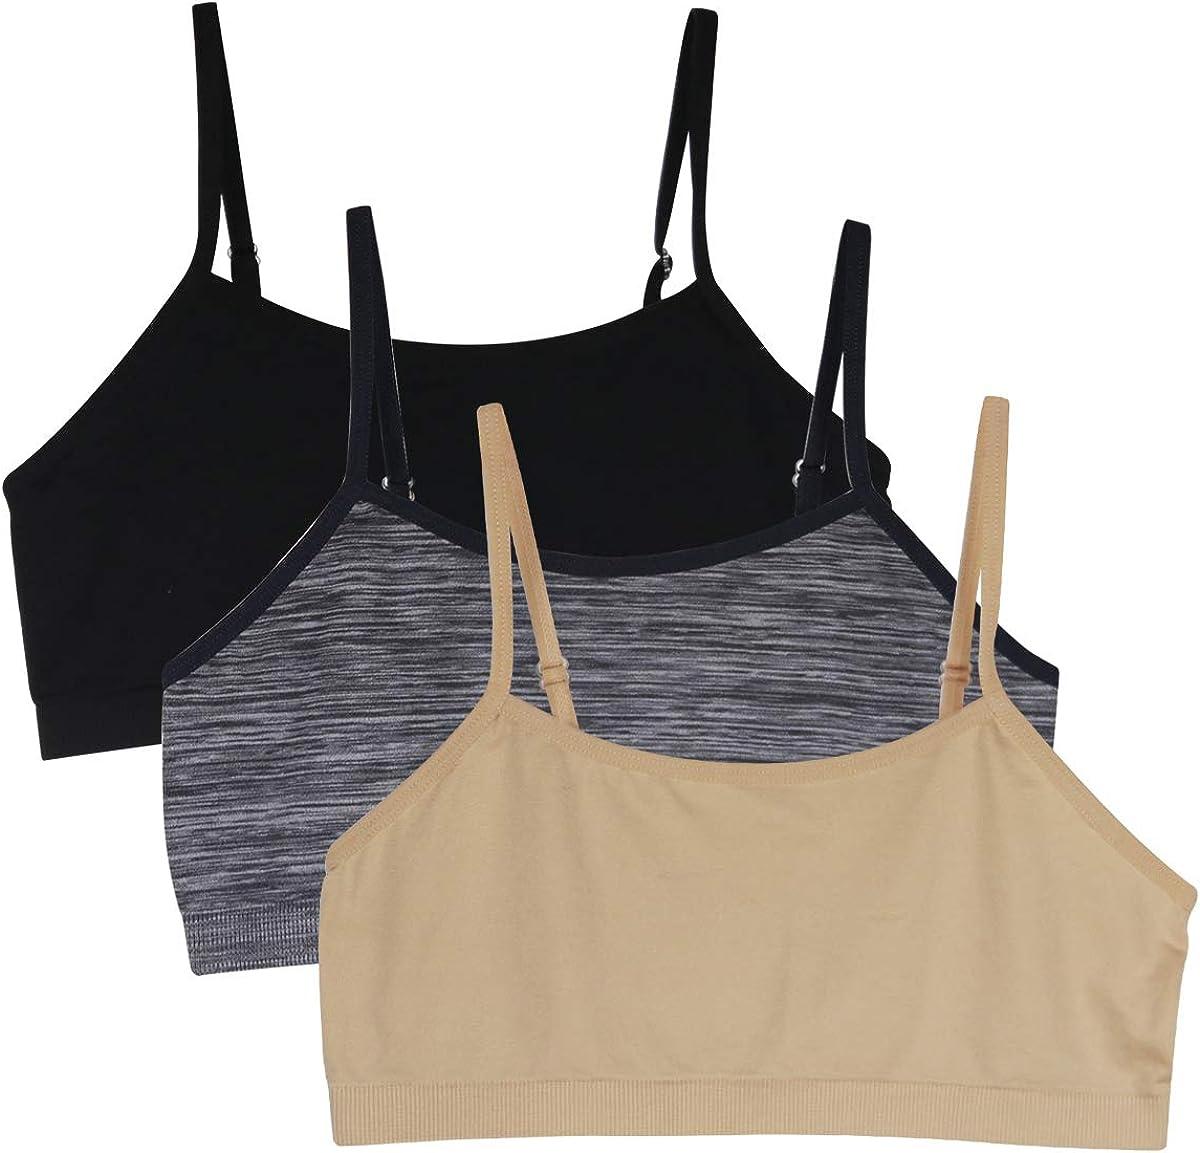 Back to School 1pcs//3pcs Baby Girls Sport Bra Vests Underwear Top Adjustable Shoulder Strap.YINI